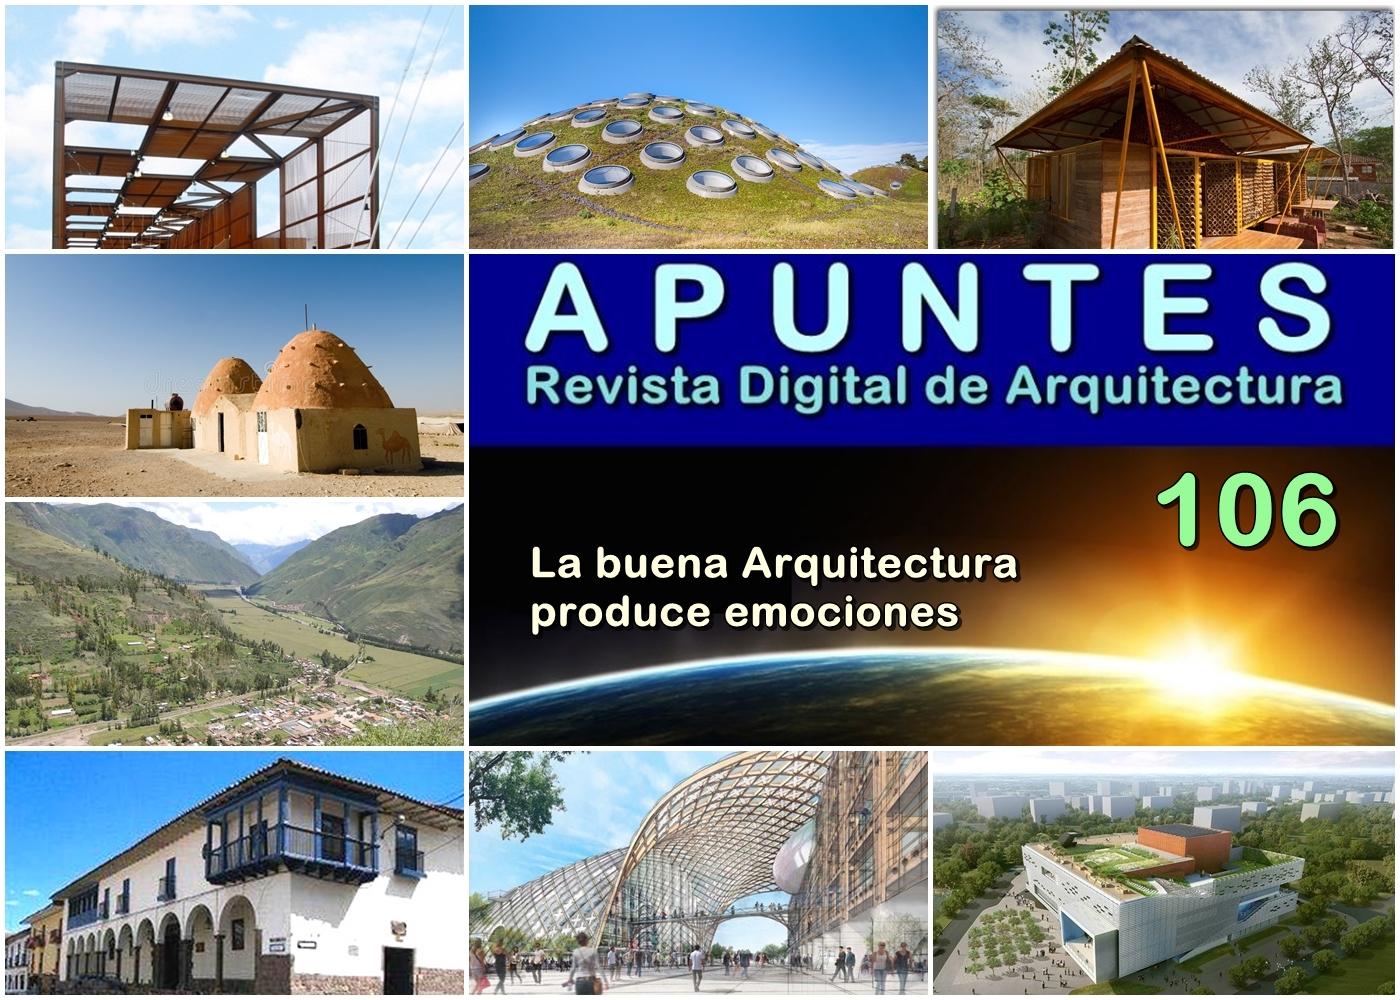 Apuntes Revista Digital De Arquitectura Apuntes 106